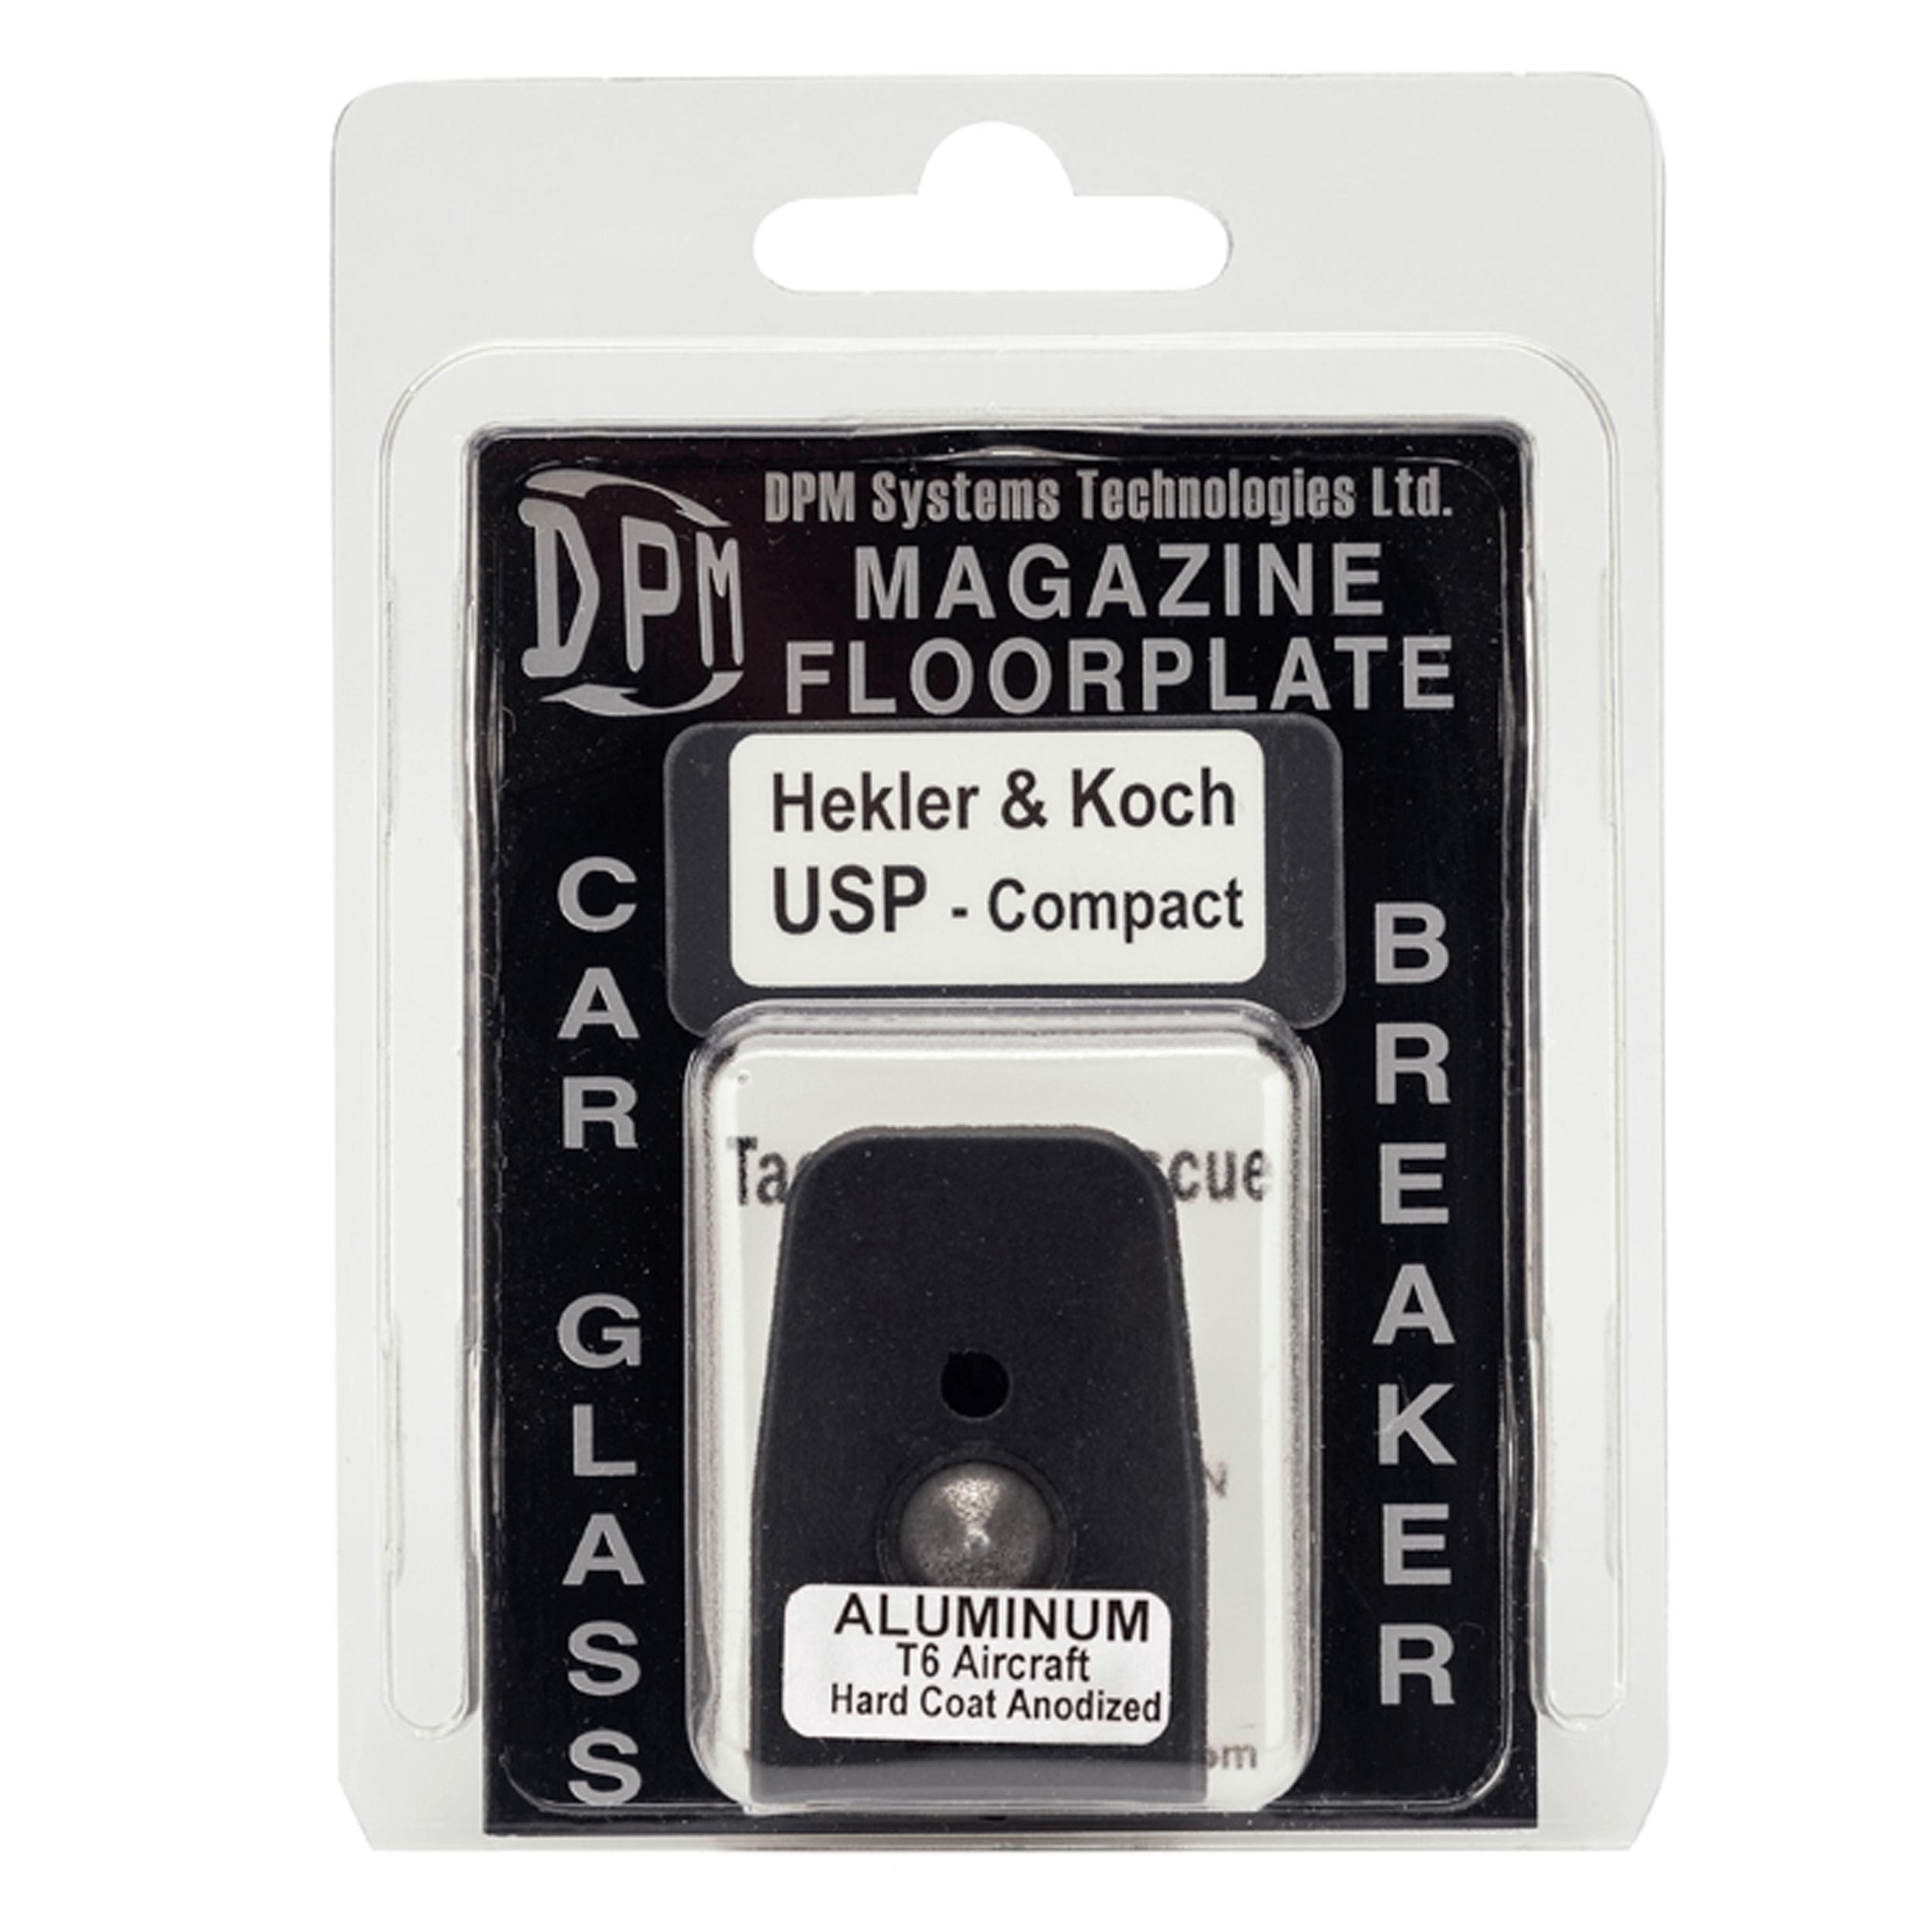 Heckler & Koch USP Compact Magazine Floorplate - Glass Breaker